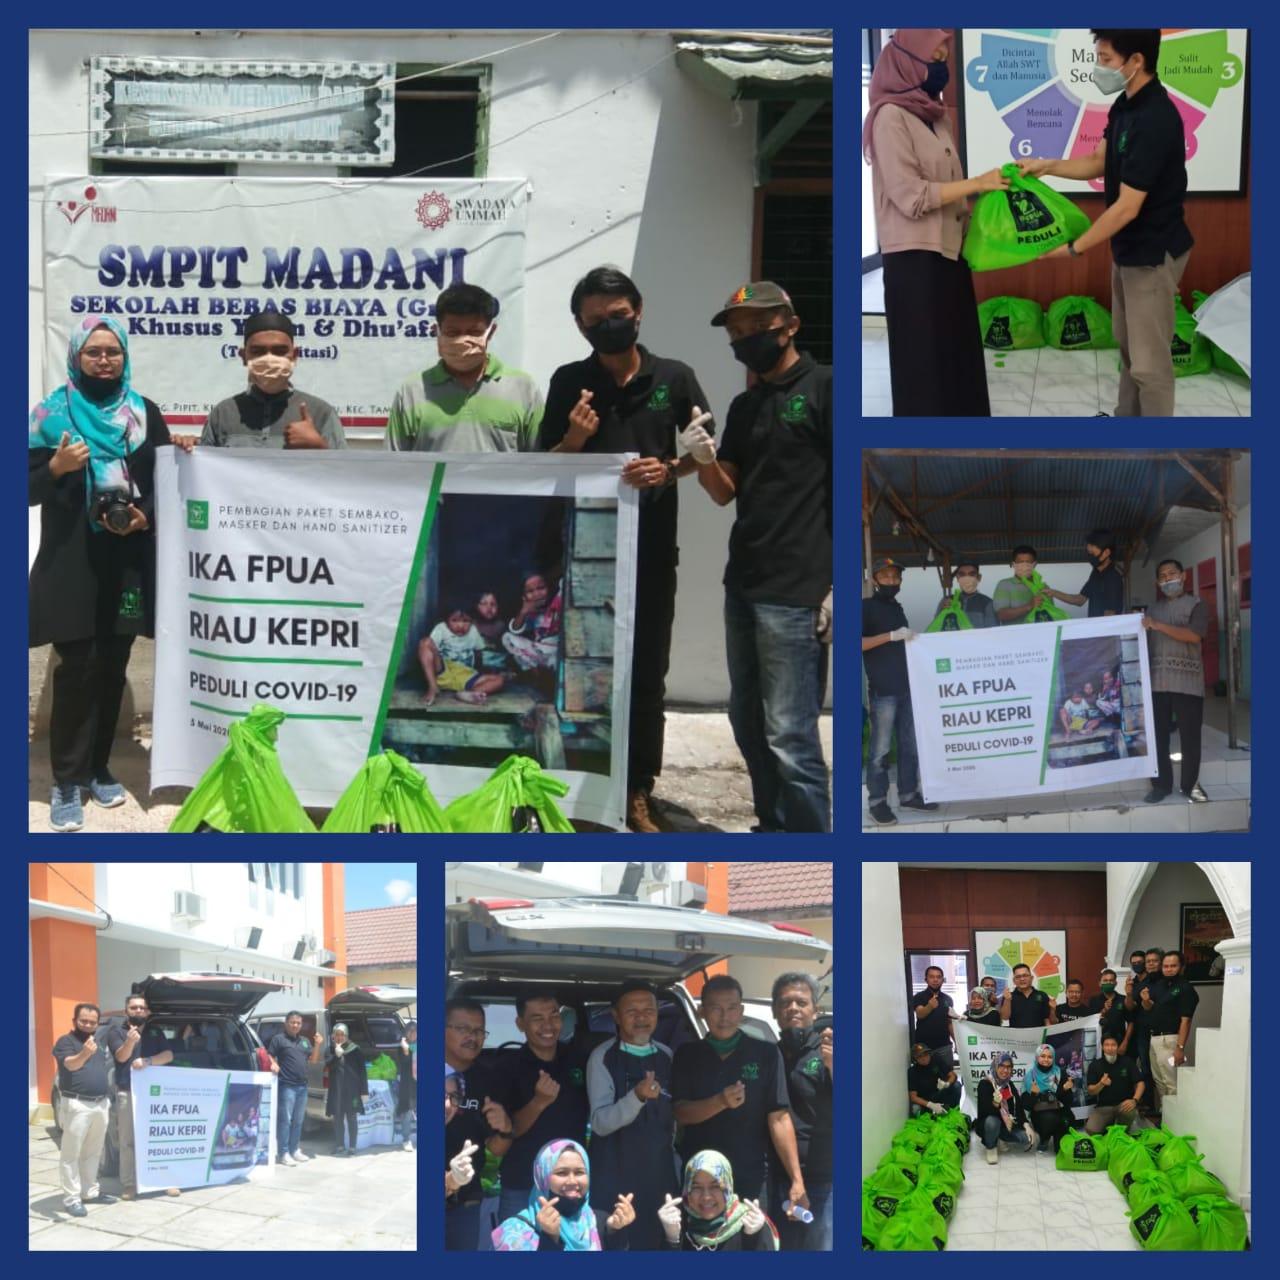 Peduli Cavid-19, IKA FPUA Riau-Kepri Salurkan BLT dan 100 Paket Sembako